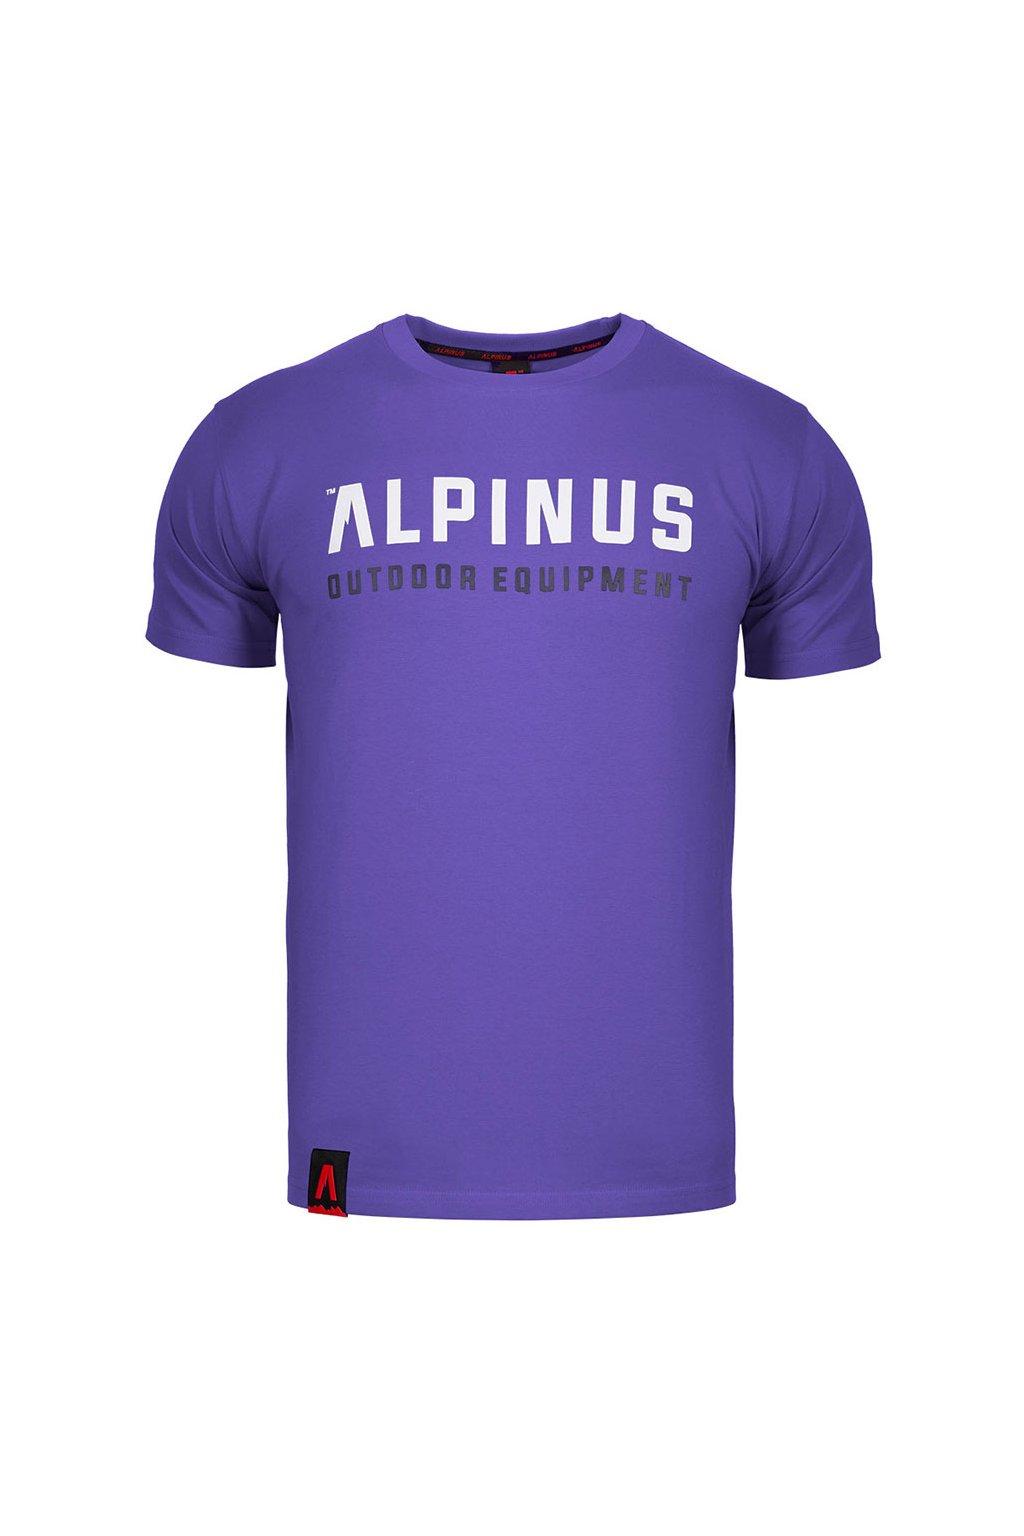 Pánske tričko Alpinus Outdoor Eqpt. fialové ALP20TC0033